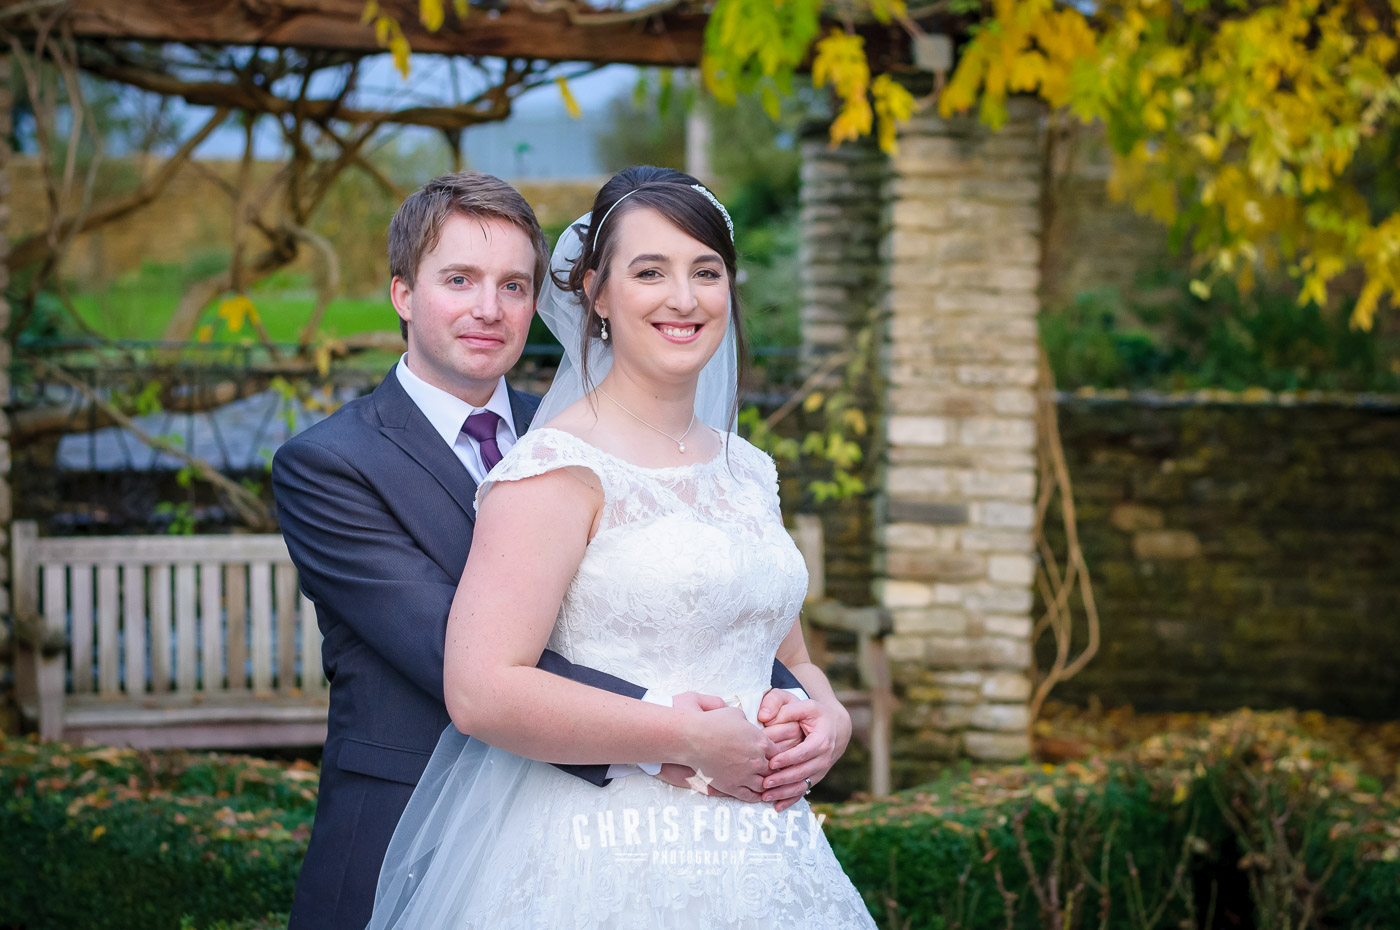 Winkworth Farm Cotswold Wiltshire Wedding Photographer Chris Fossey Photography